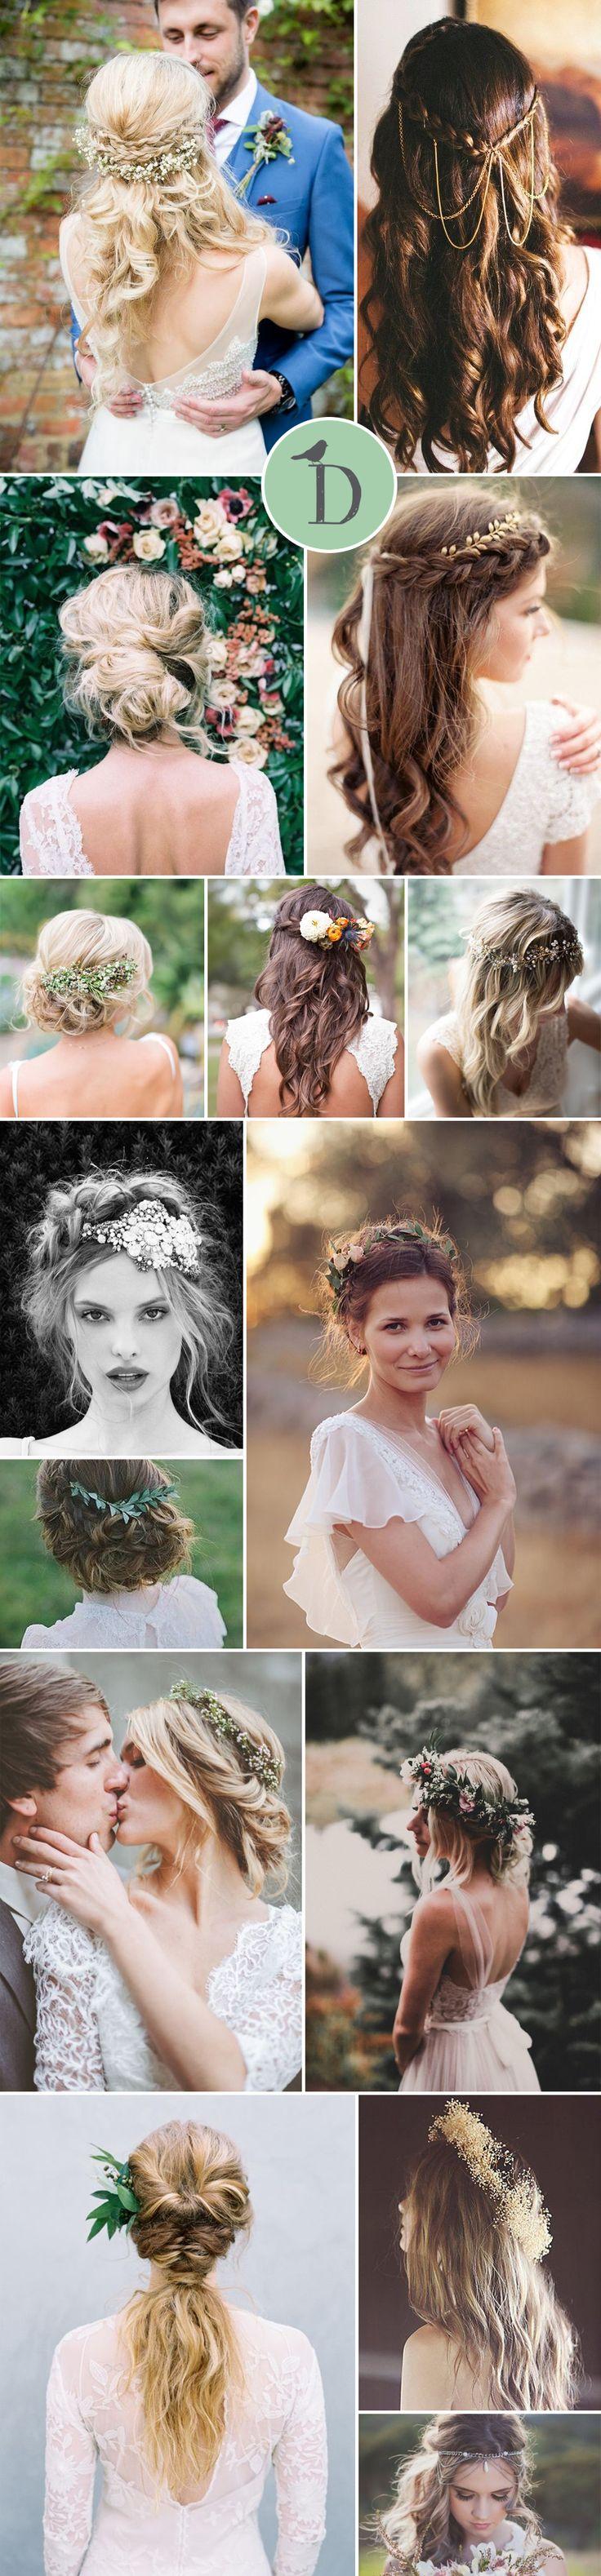 best my stuff images on pinterest cake wedding tree themed